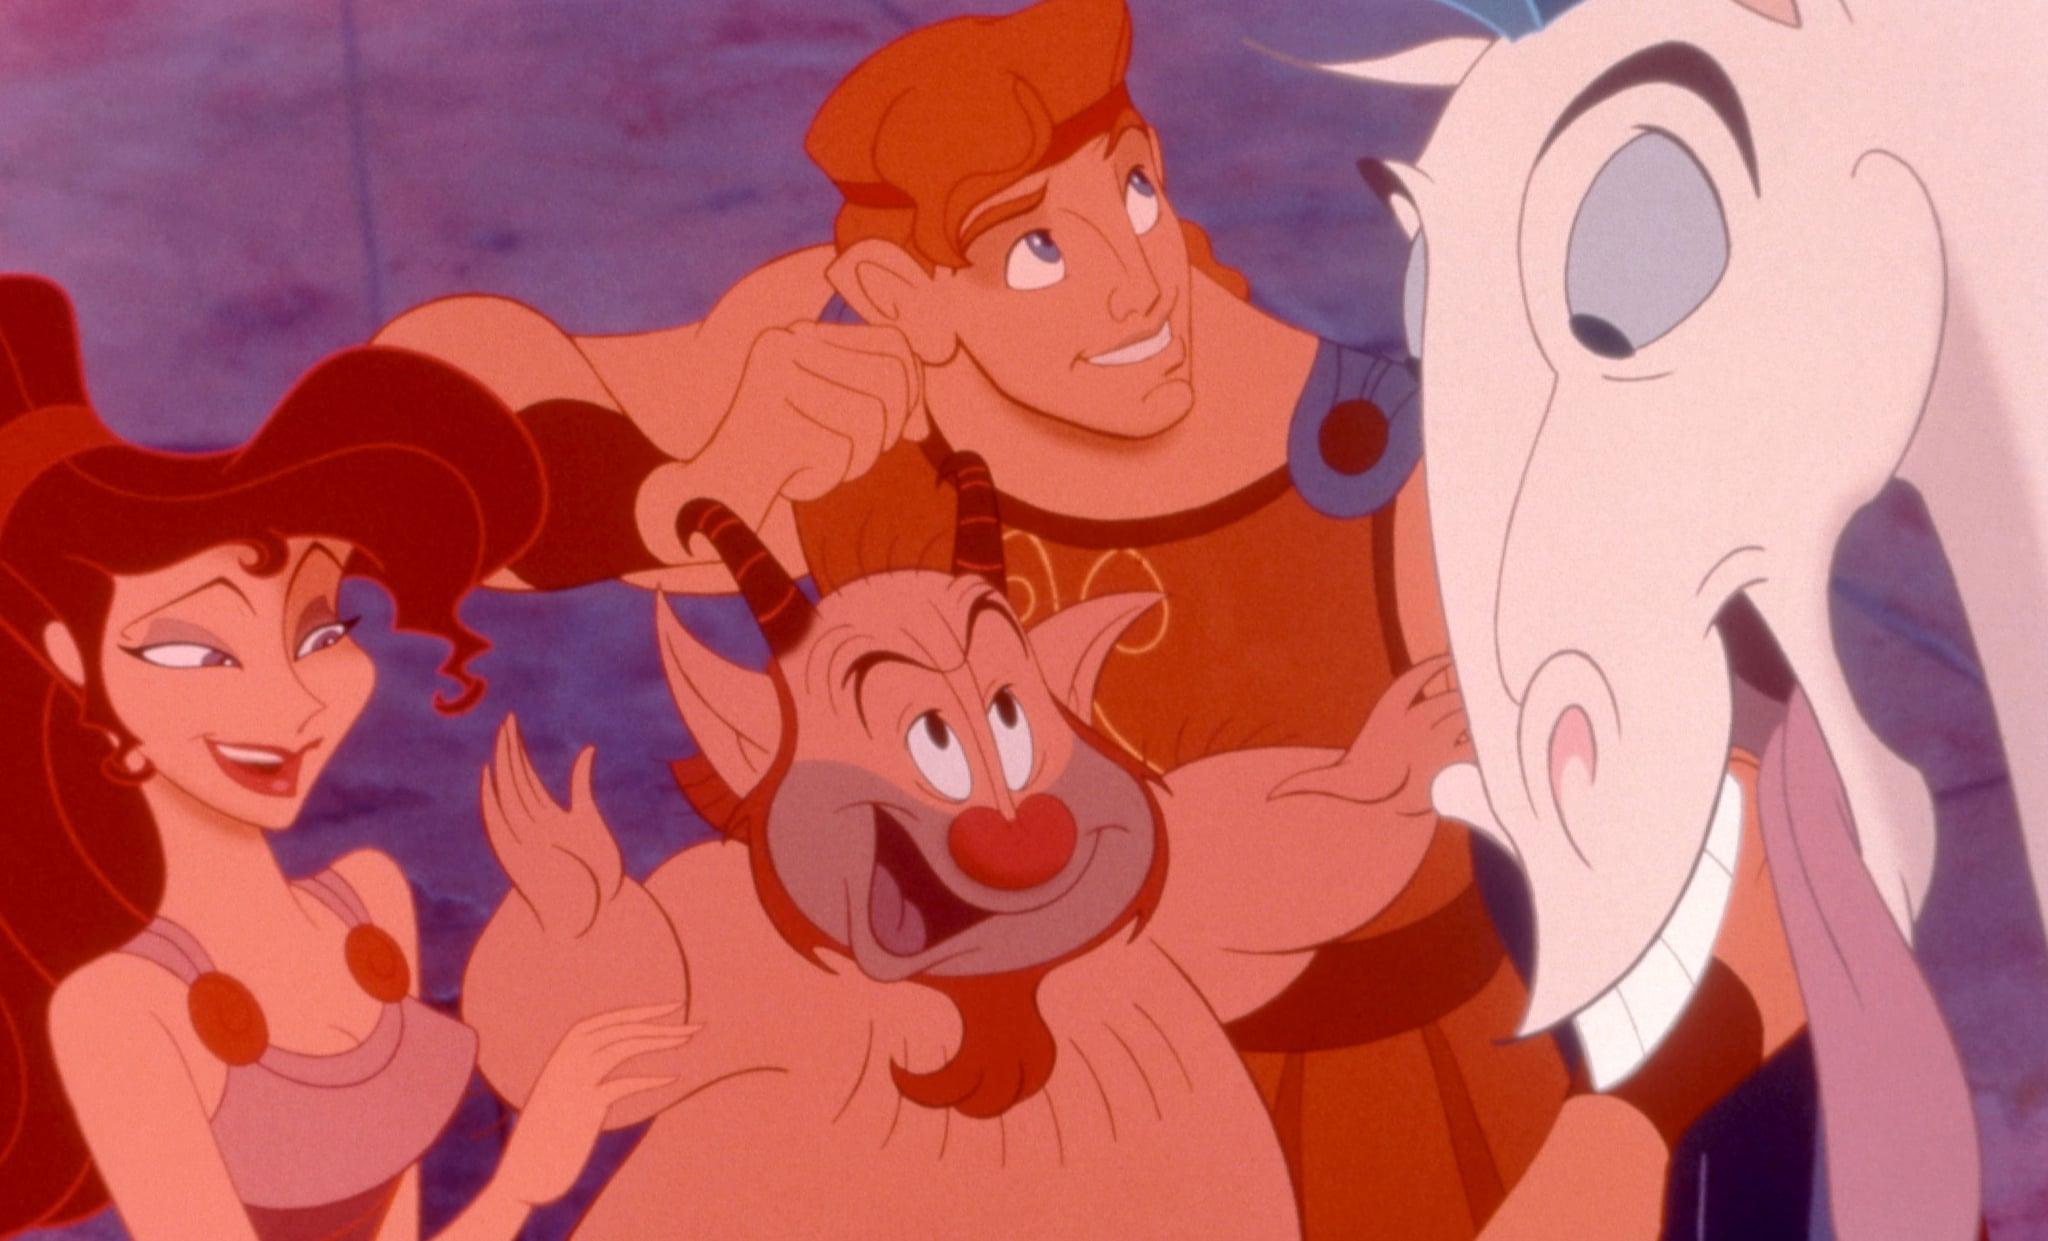 HERCULES, Megara, Hercules, Philoctetes, Pegasus, 1997, (c)Buena Vista Pictures/courtesy Everett Collection